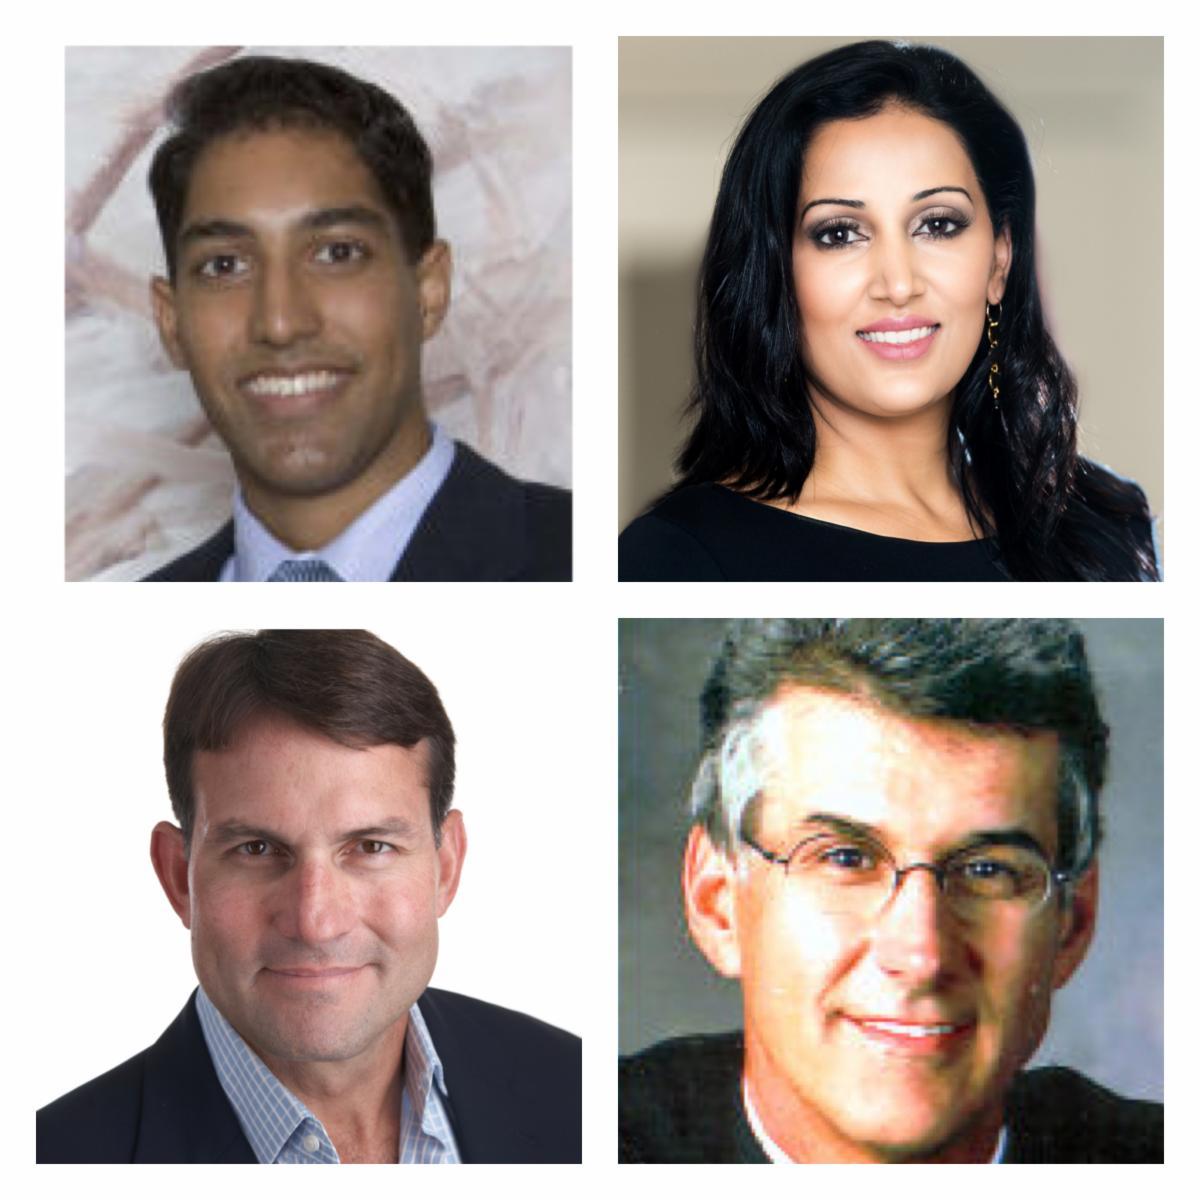 Drs Anurag Agarwal, Kiran Gill, Paul Gardner, and Richard Maloney